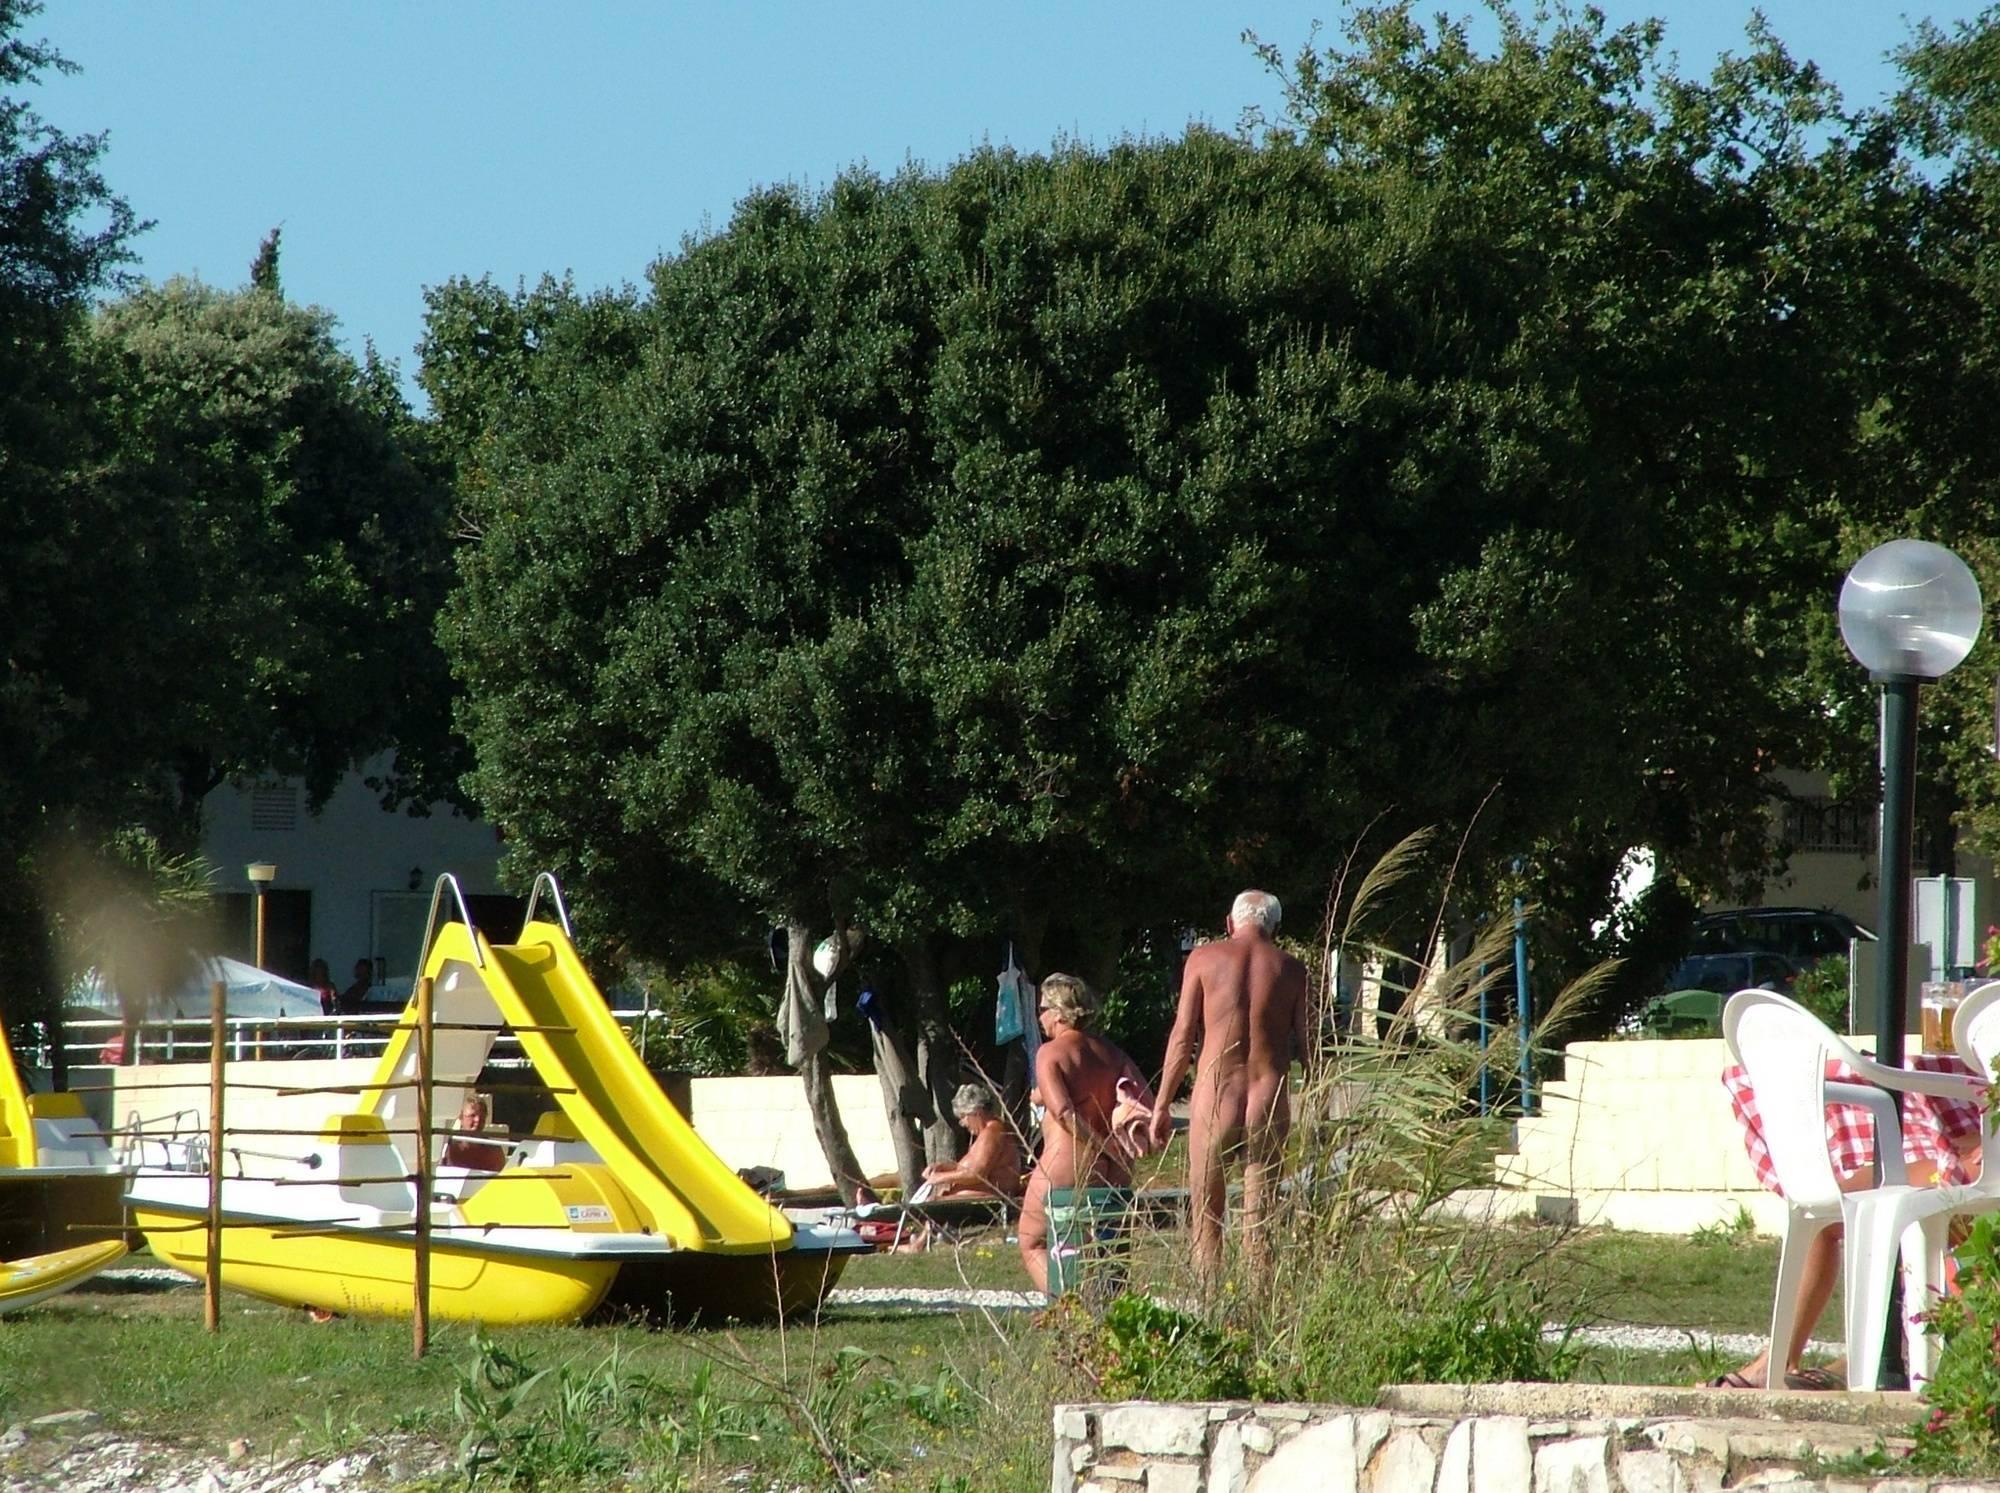 Pure Nudism-Naturist FKK Grass Shore - 1